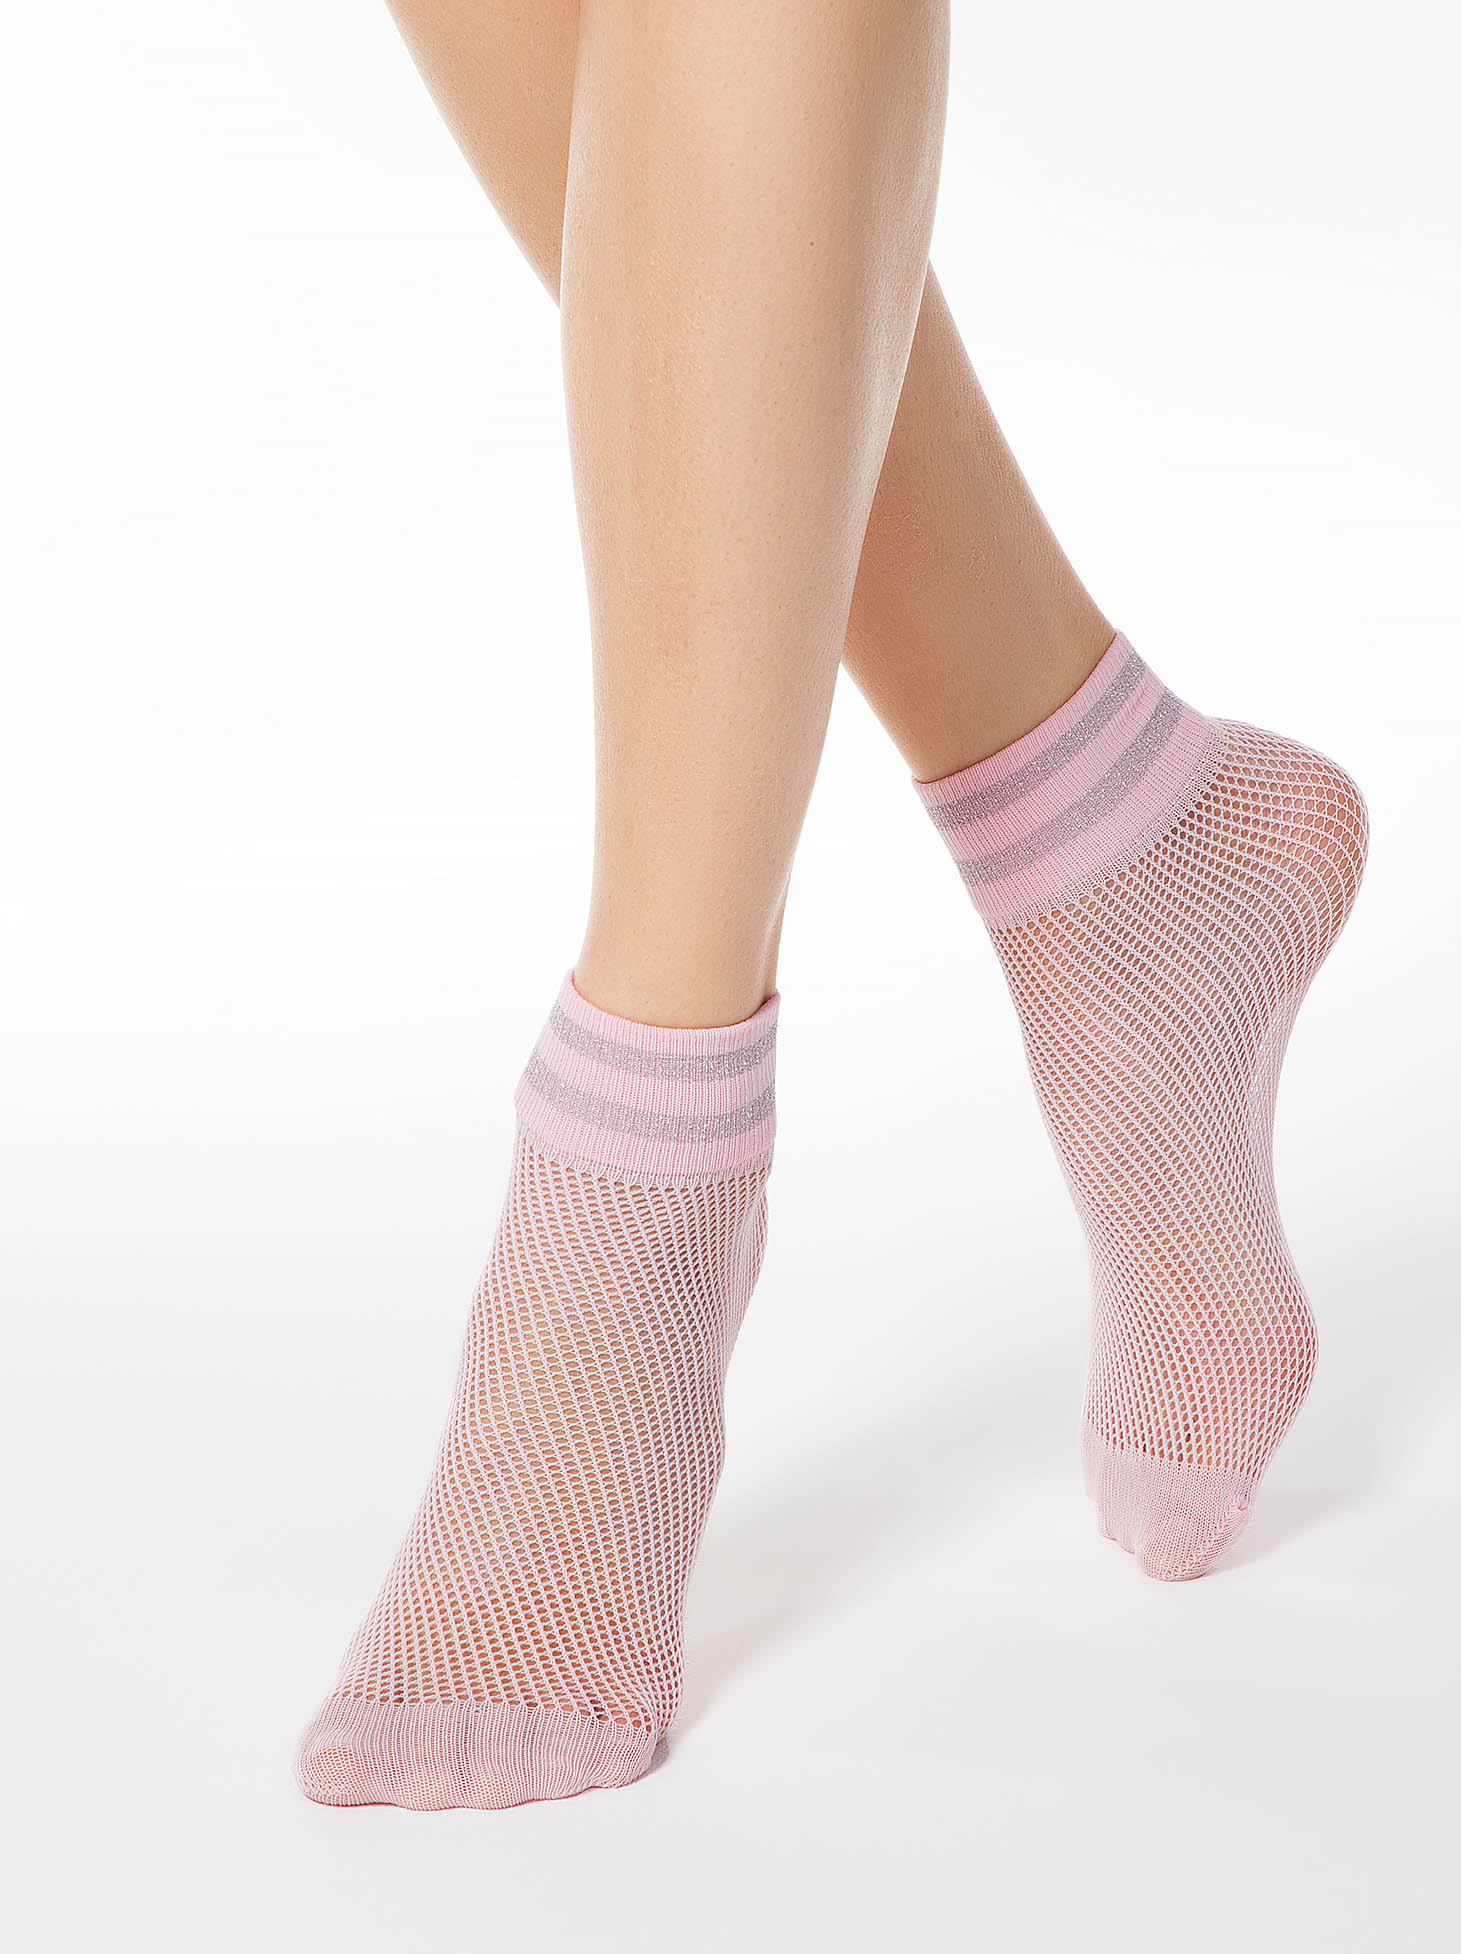 Sosete roz deschis din material elastic tip plasa si insertii de tesatura metalica cu luciu